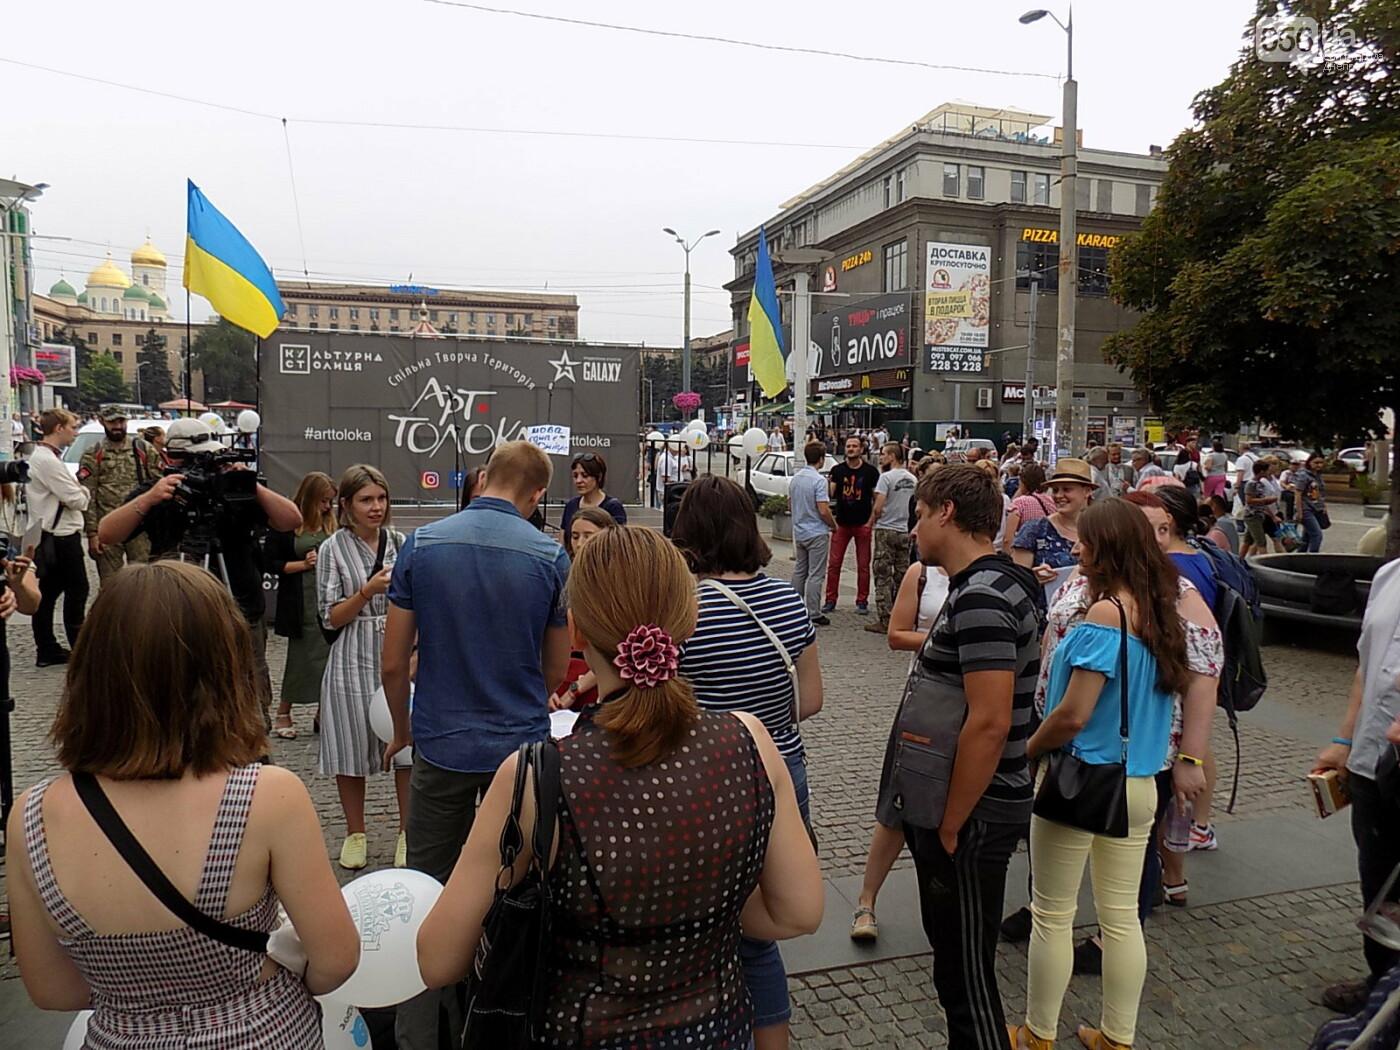 """Мова єднає Дніпро"": в центре города прошла символическая акция с концертом и подарками, - ФОТО, фото-7"